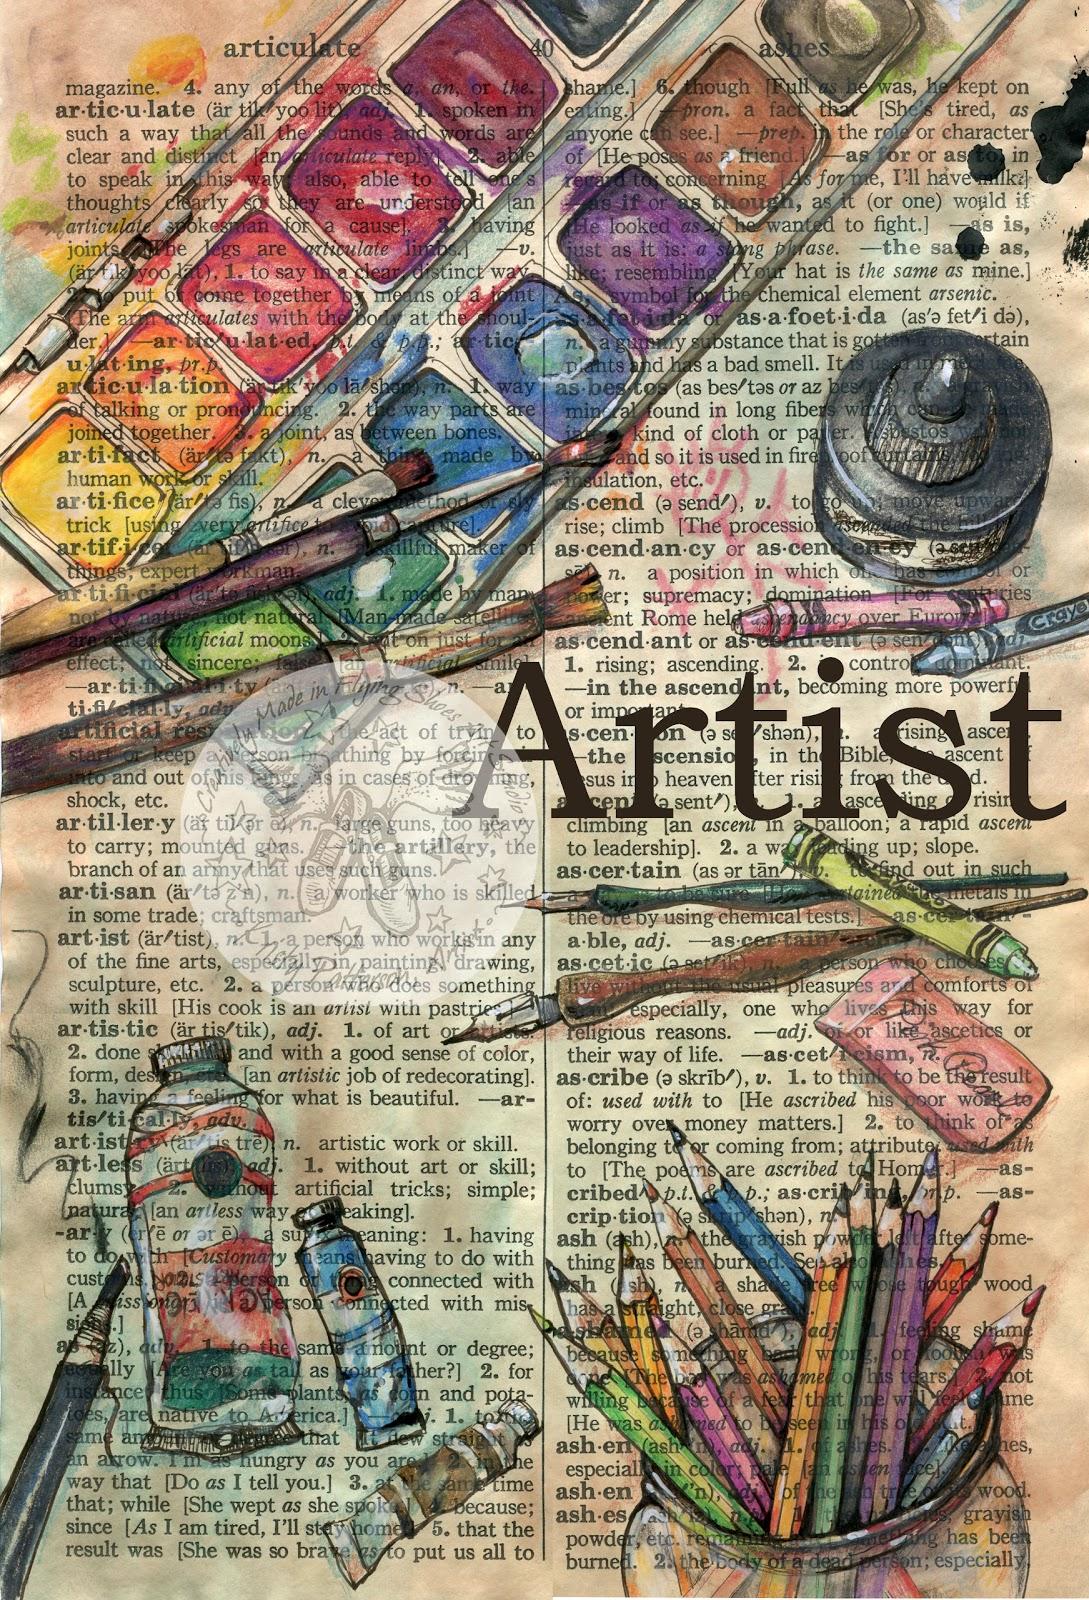 http://4.bp.blogspot.com/-XzpEMKMMw3A/UIW4yy_tkXI/AAAAAAAABEo/WZ4Nmtqzsc4/s1600/artist+copy.jpg